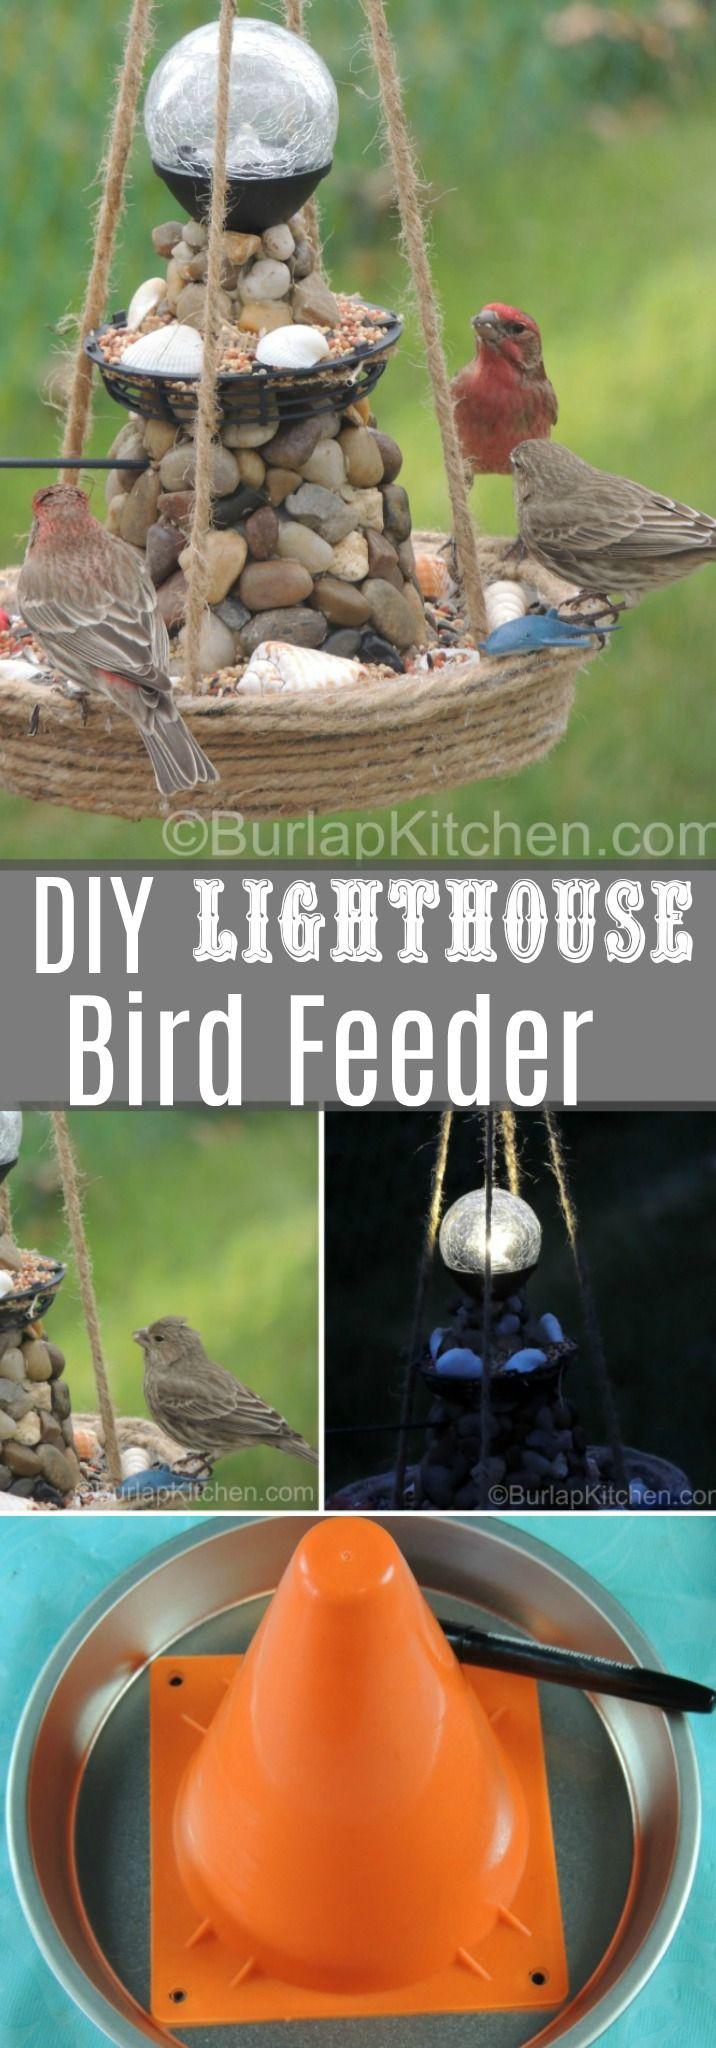 A fun craft for the birds! This Lighthouse bird fe…